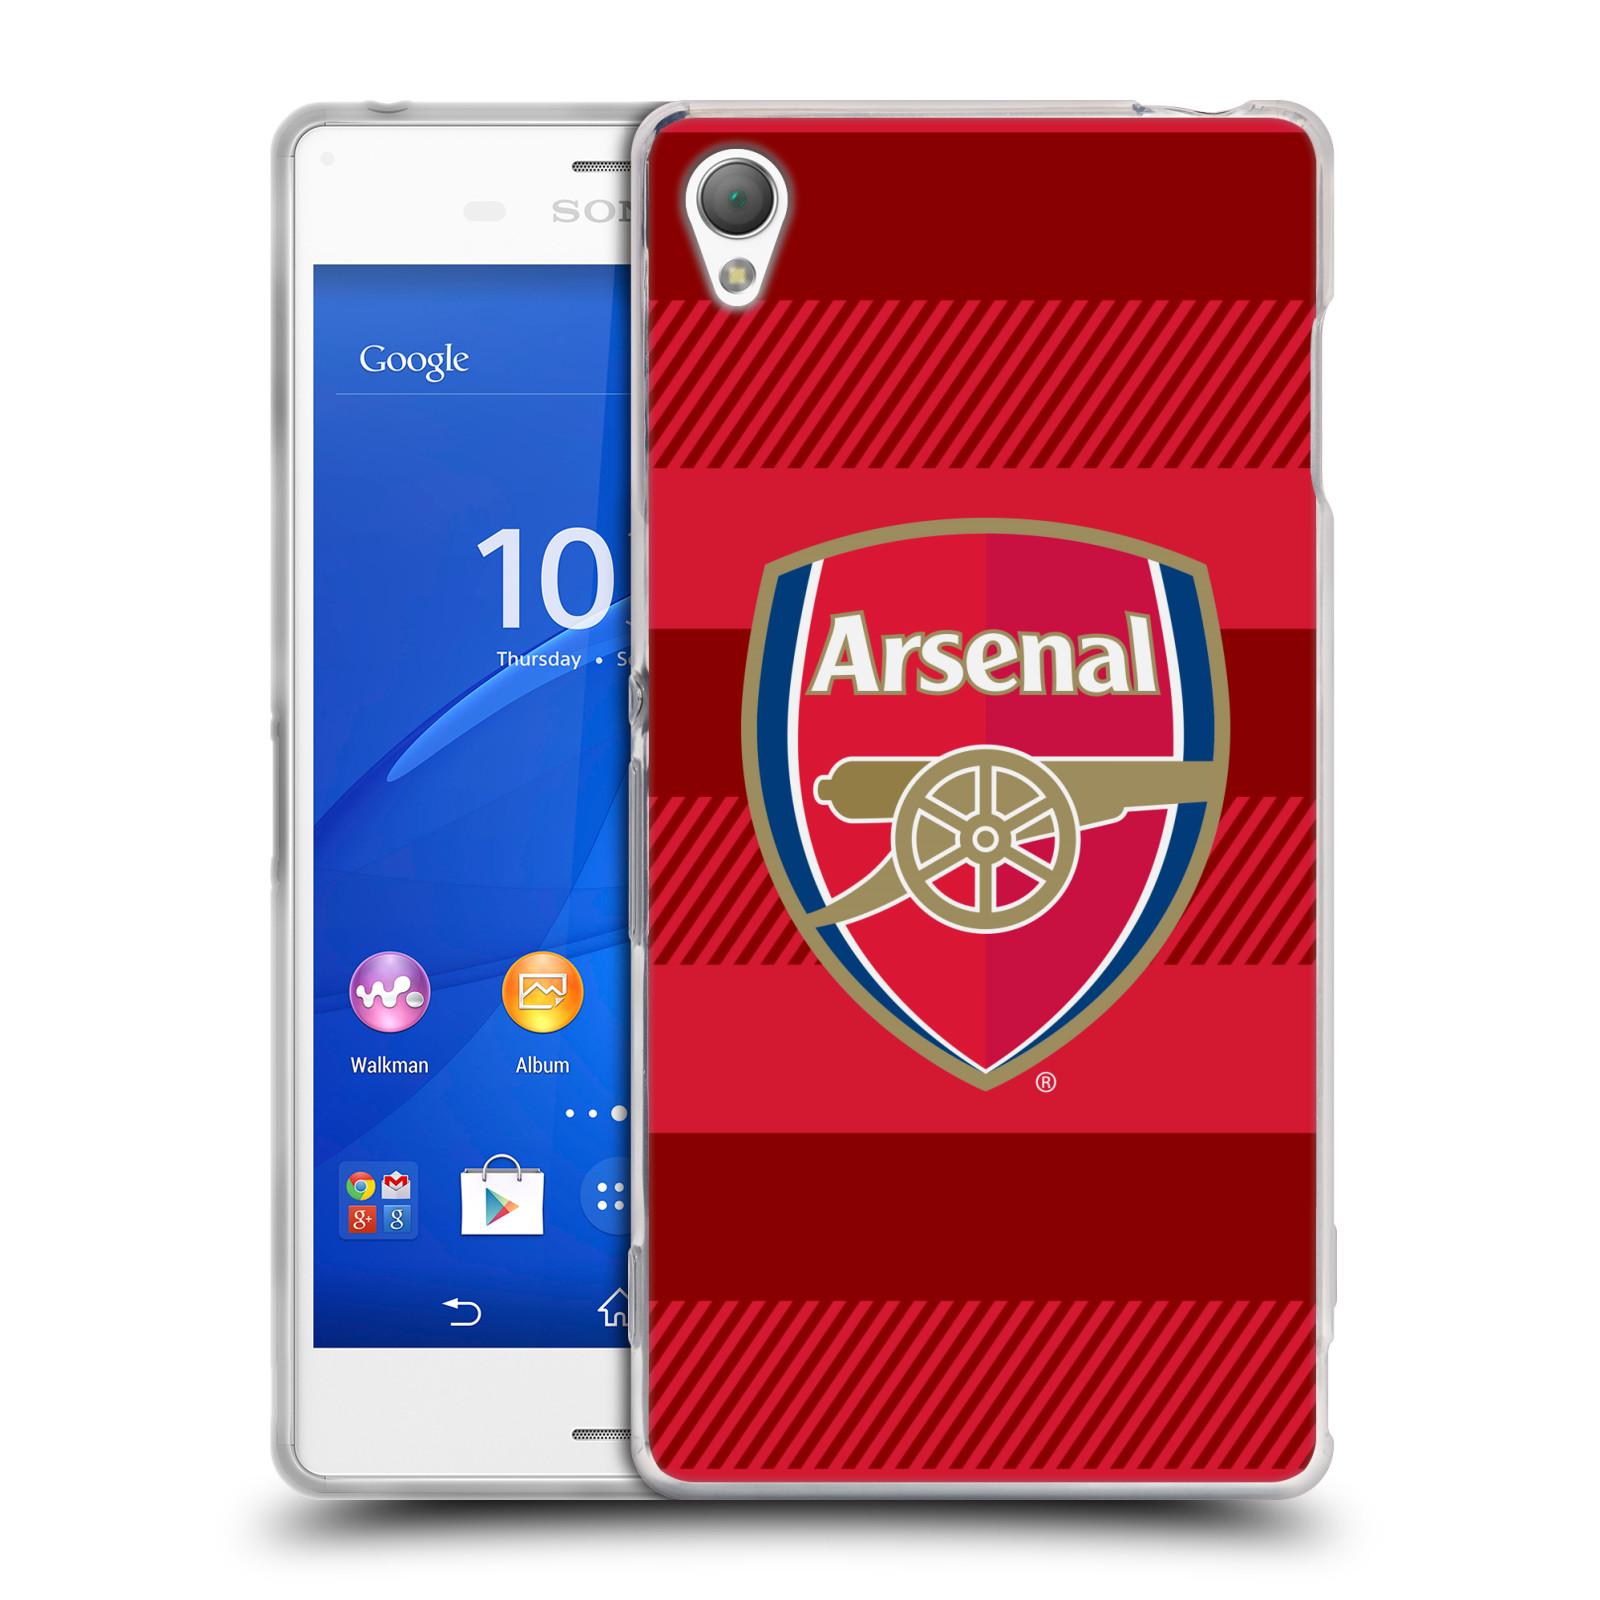 Silikonové pouzdro na mobil Sony Xperia Z3 D6603 - Head Case - Arsenal FC - Logo s pruhy